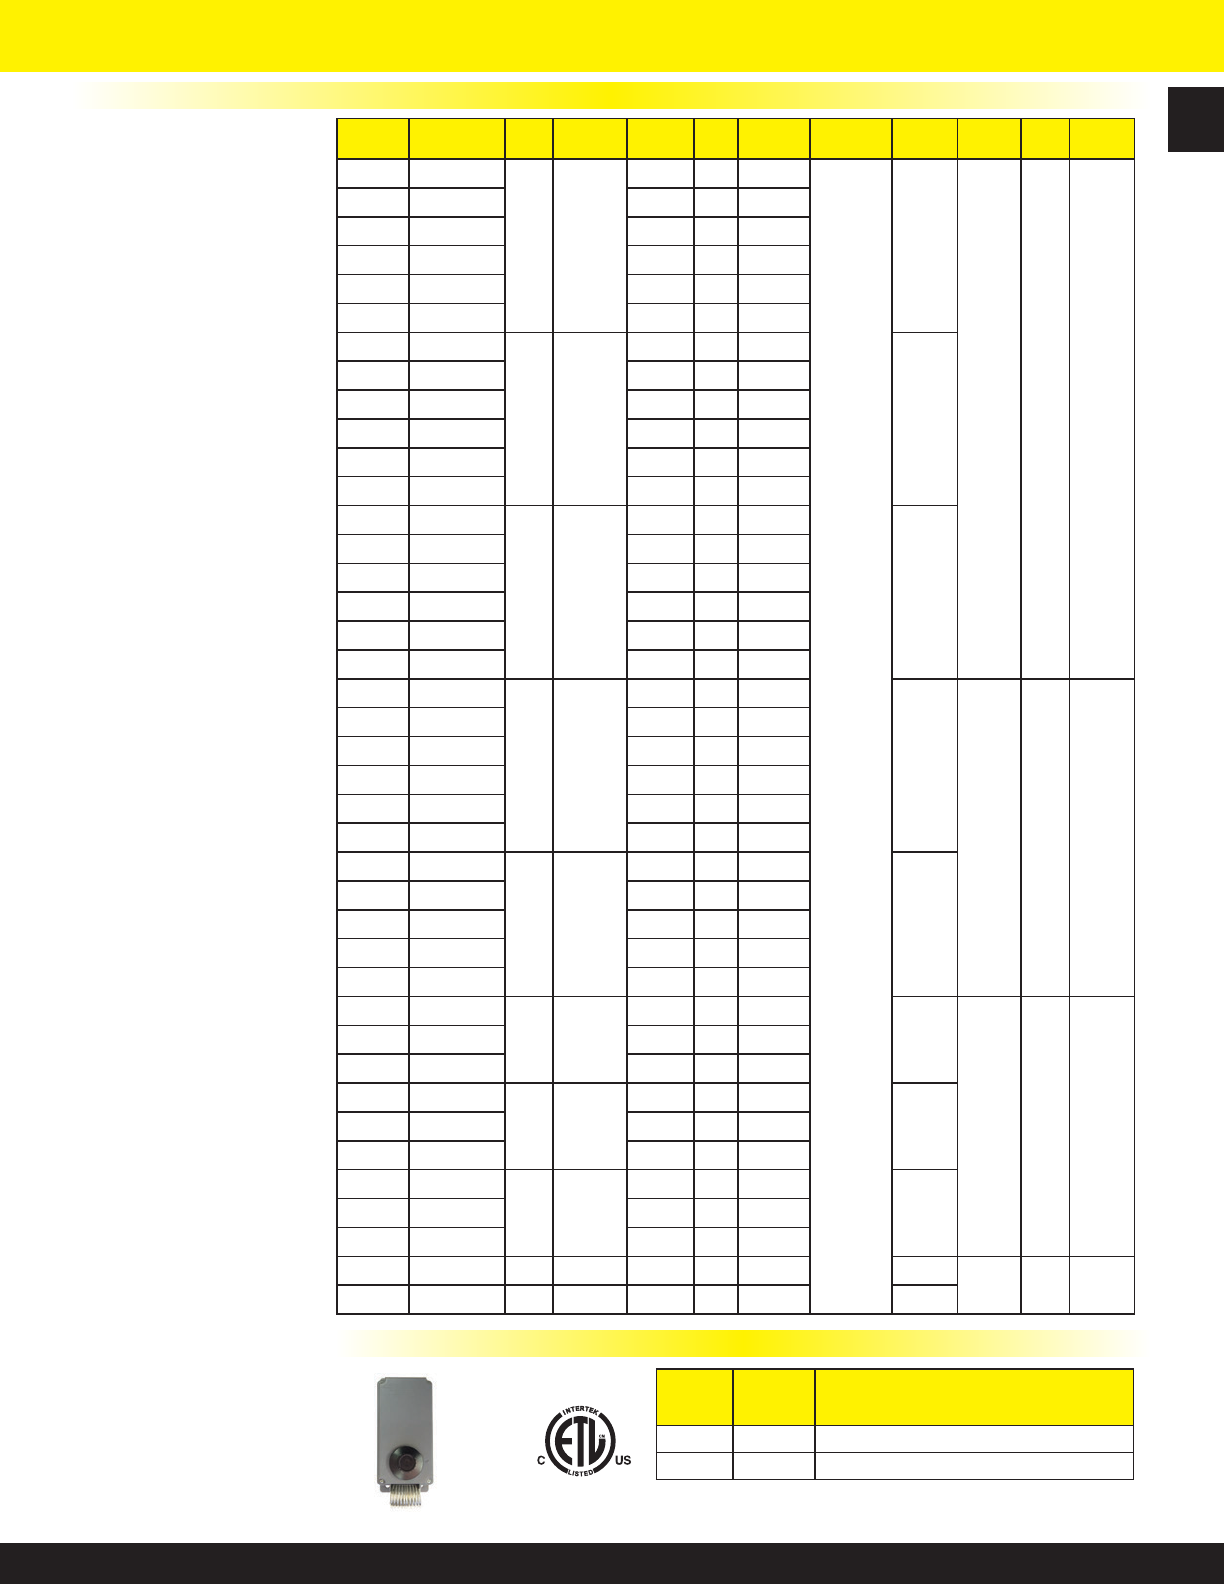 worldart @ heater Wall Quartz Halogen Heater 2 Bar 1200W With 2 Heat Settings Square wall heater